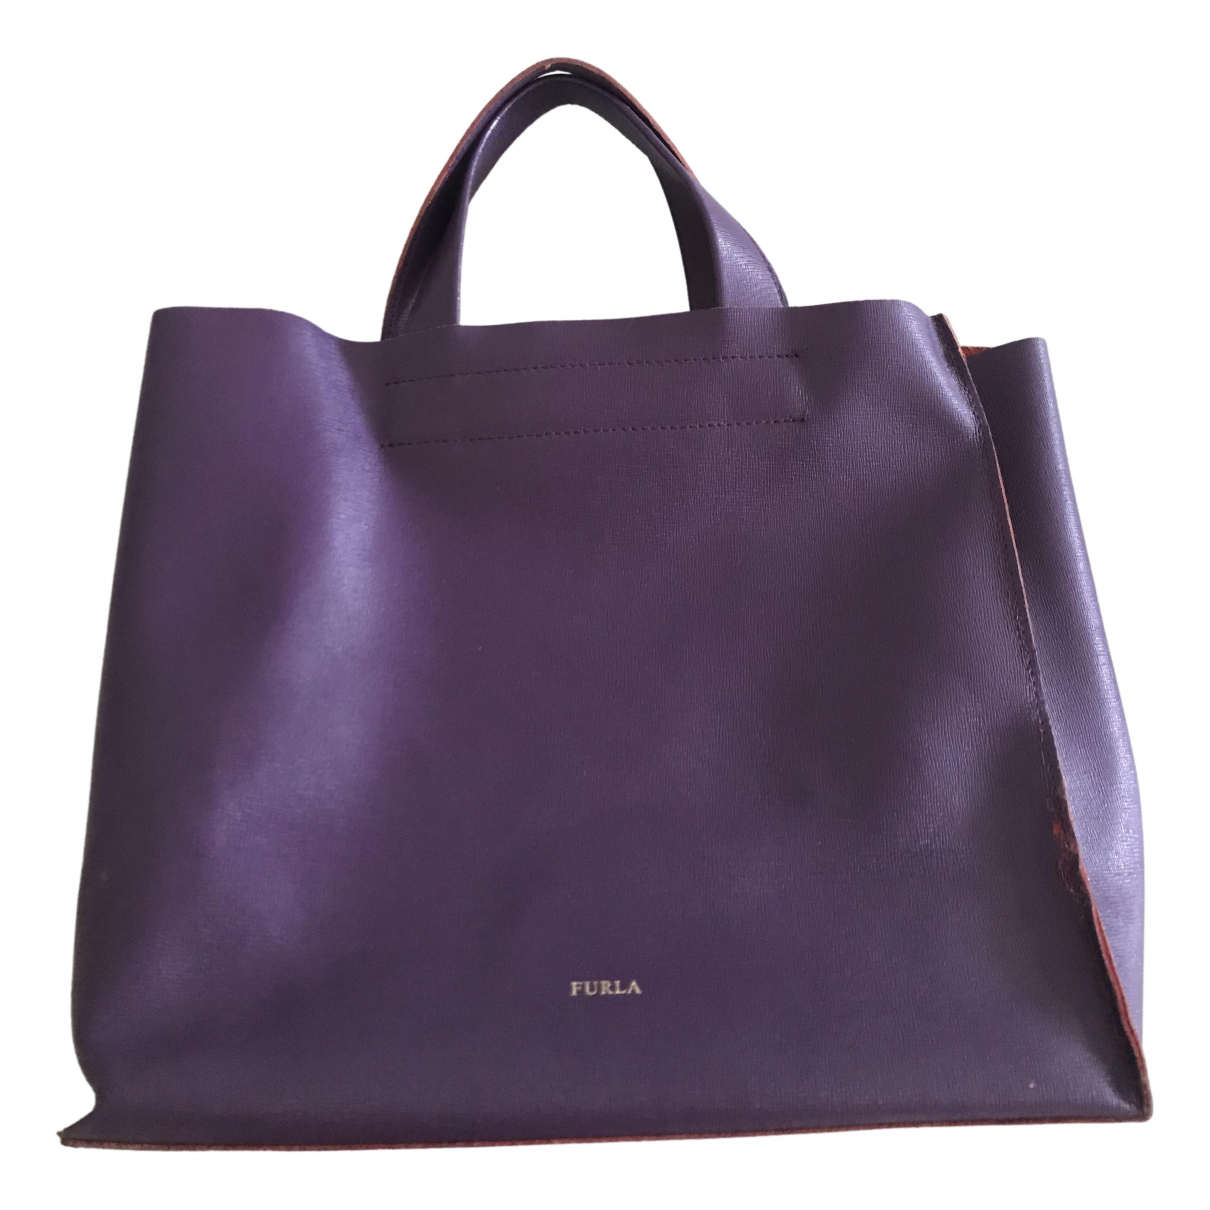 Furla \N Purple Leather handbag for Women \N